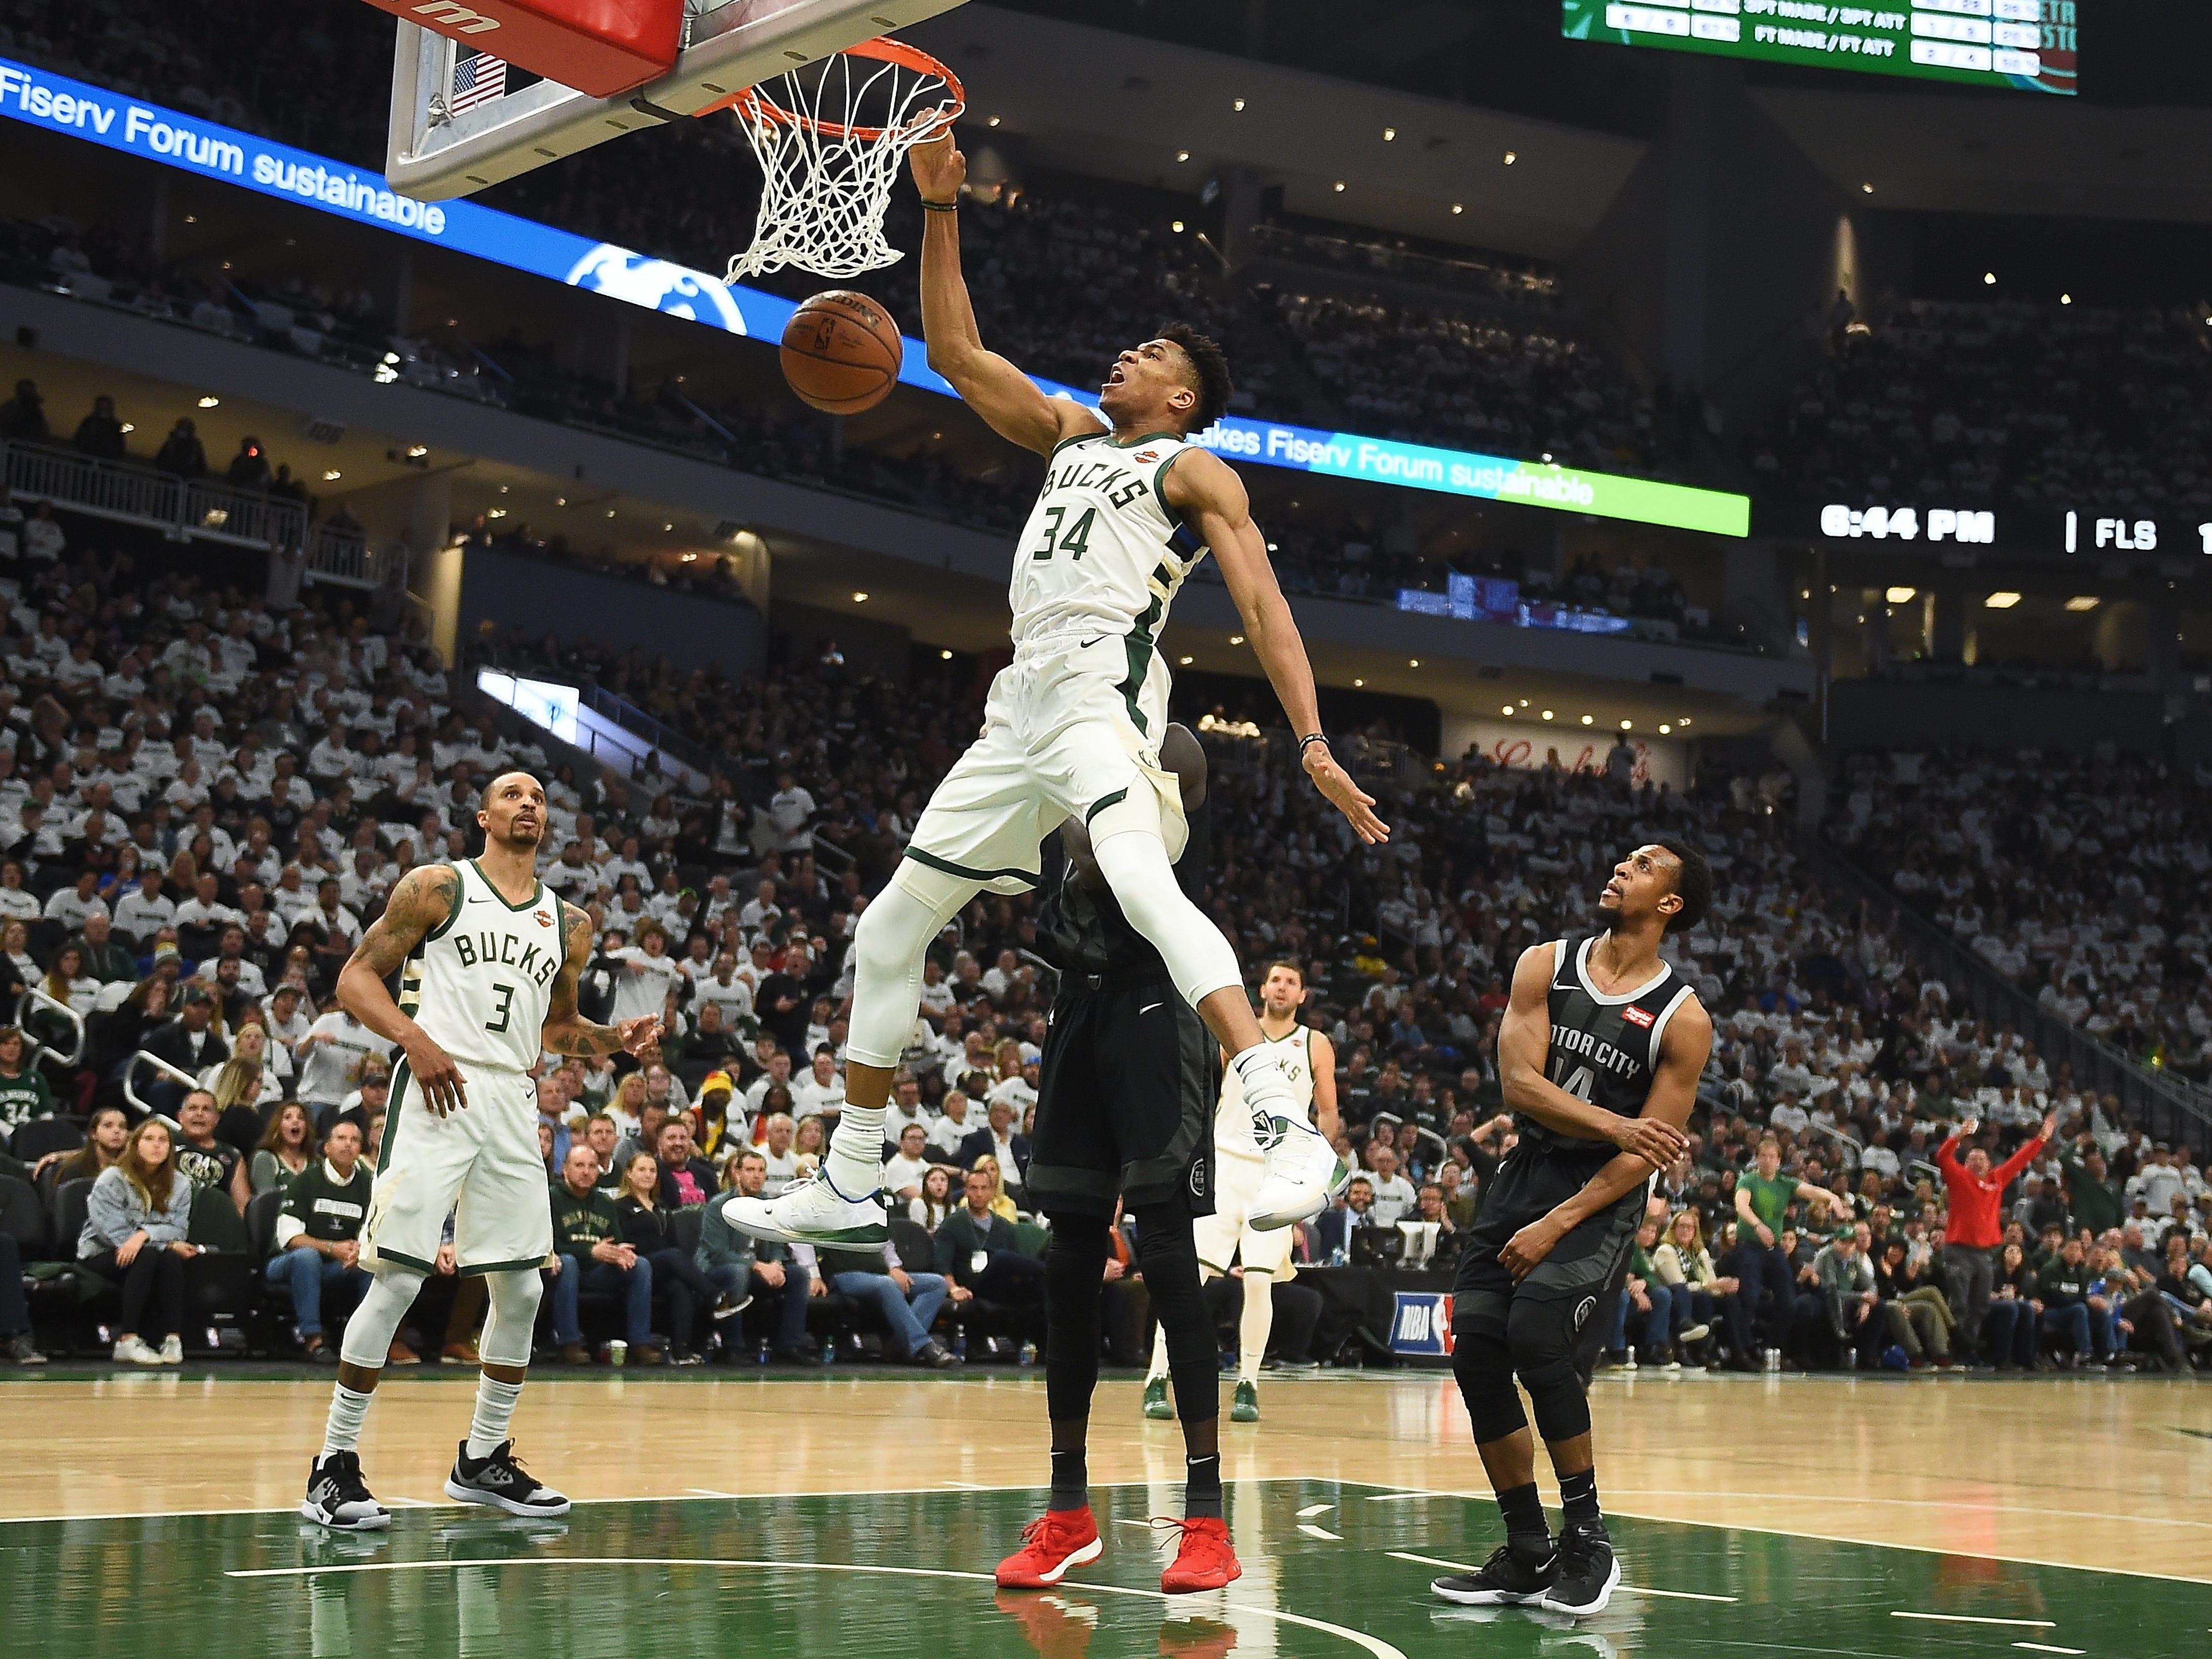 Milwaukee Bucks' Giannis Antetokounmpo dunks against the Detroit Pistons during Game 1 at Fiserv Forum on April 14, 2019 in Milwaukee.